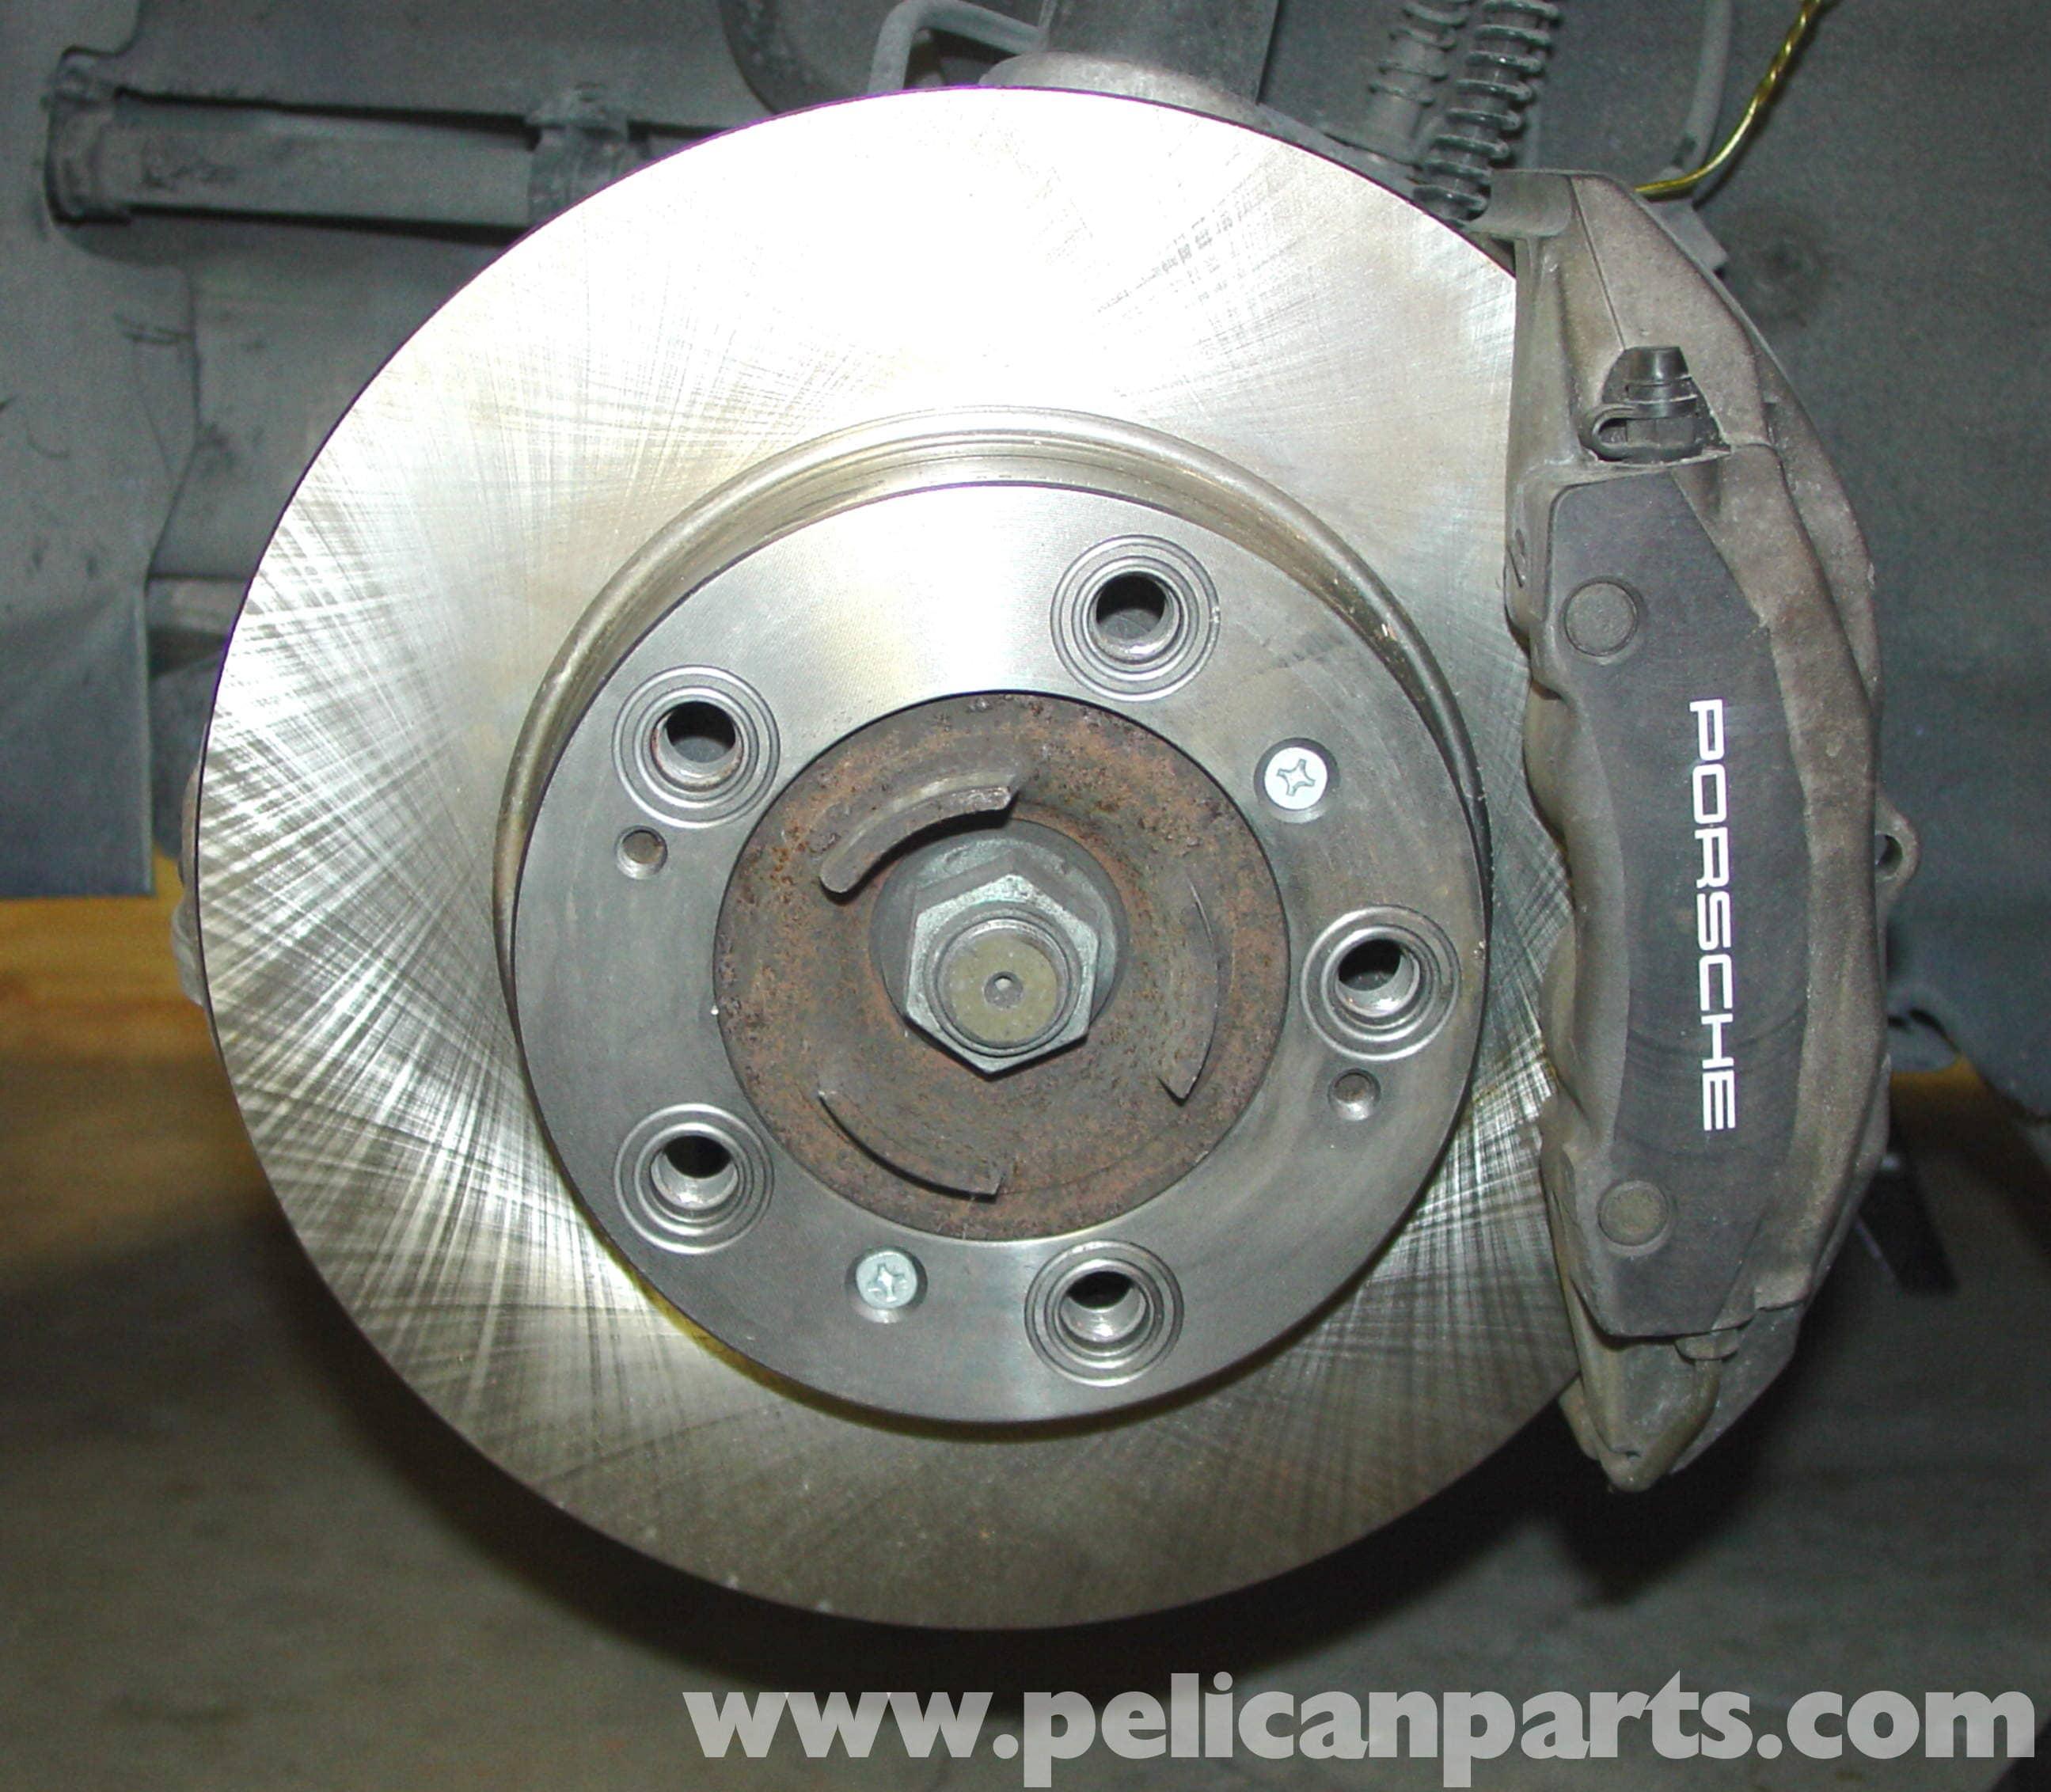 Porsche 996 Automatic Transmission Removal: Porsche 911 Carrera Brake Disc Replacement